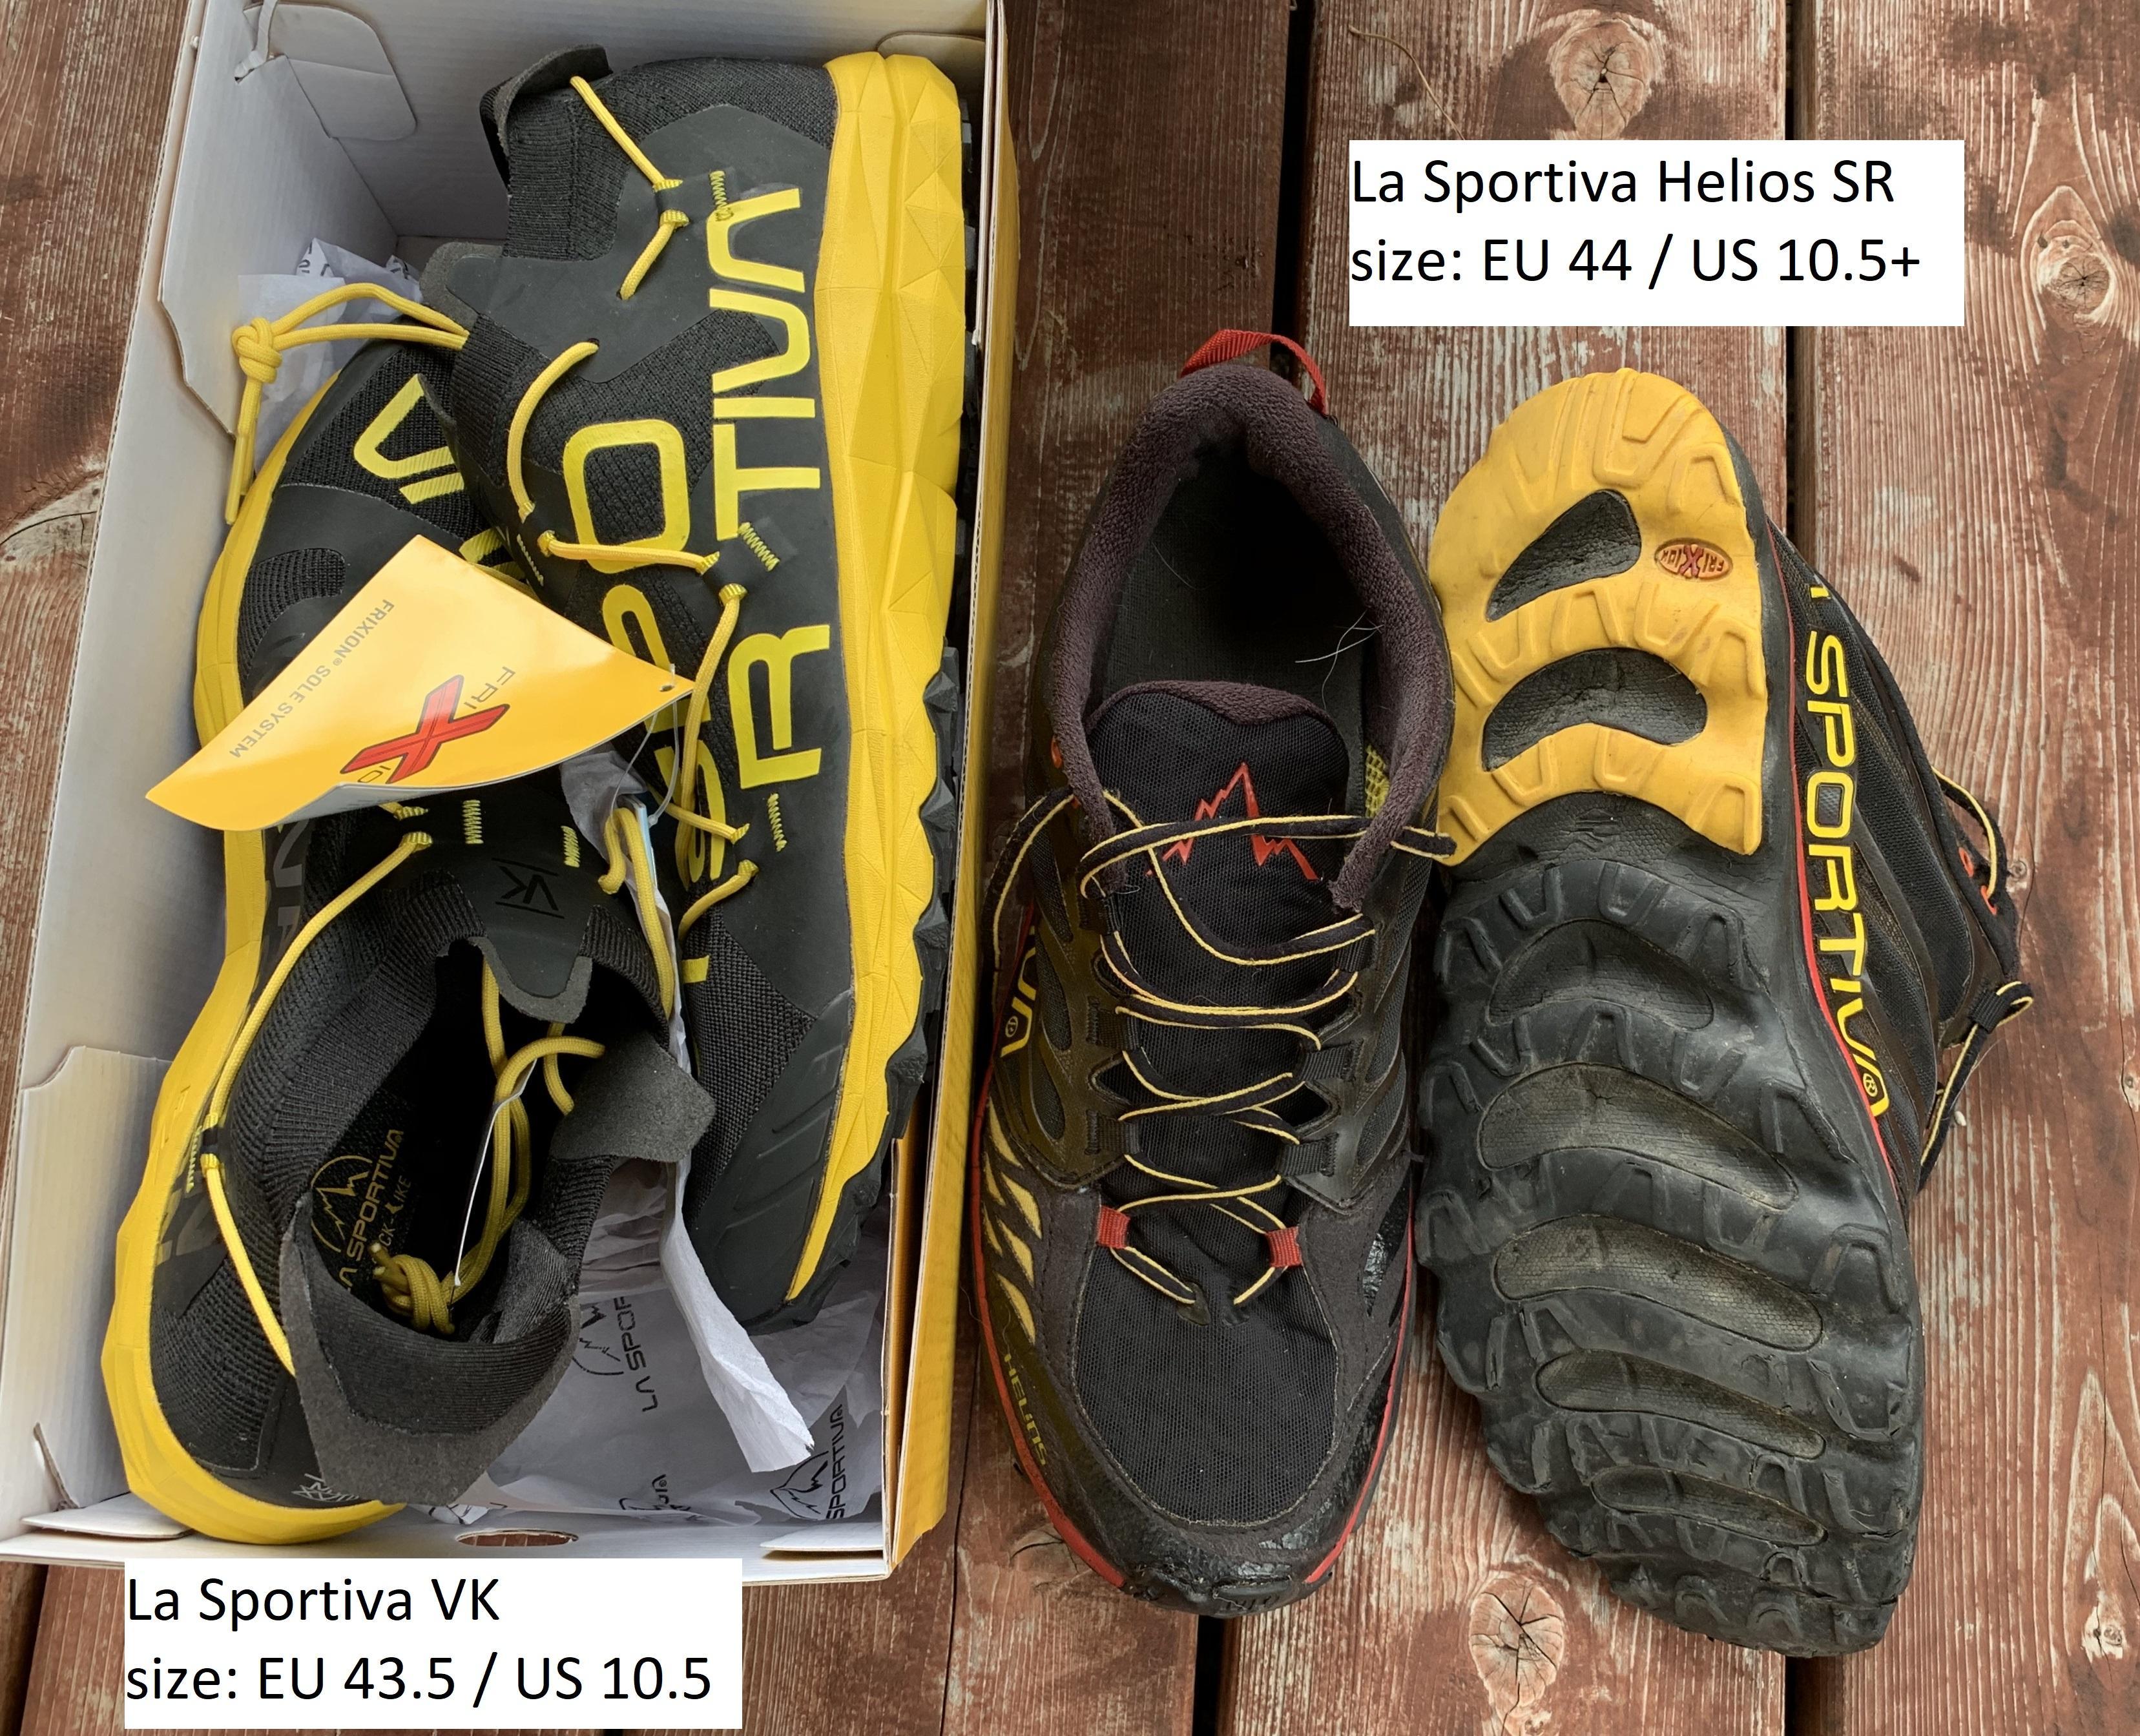 LaSportiva shoes